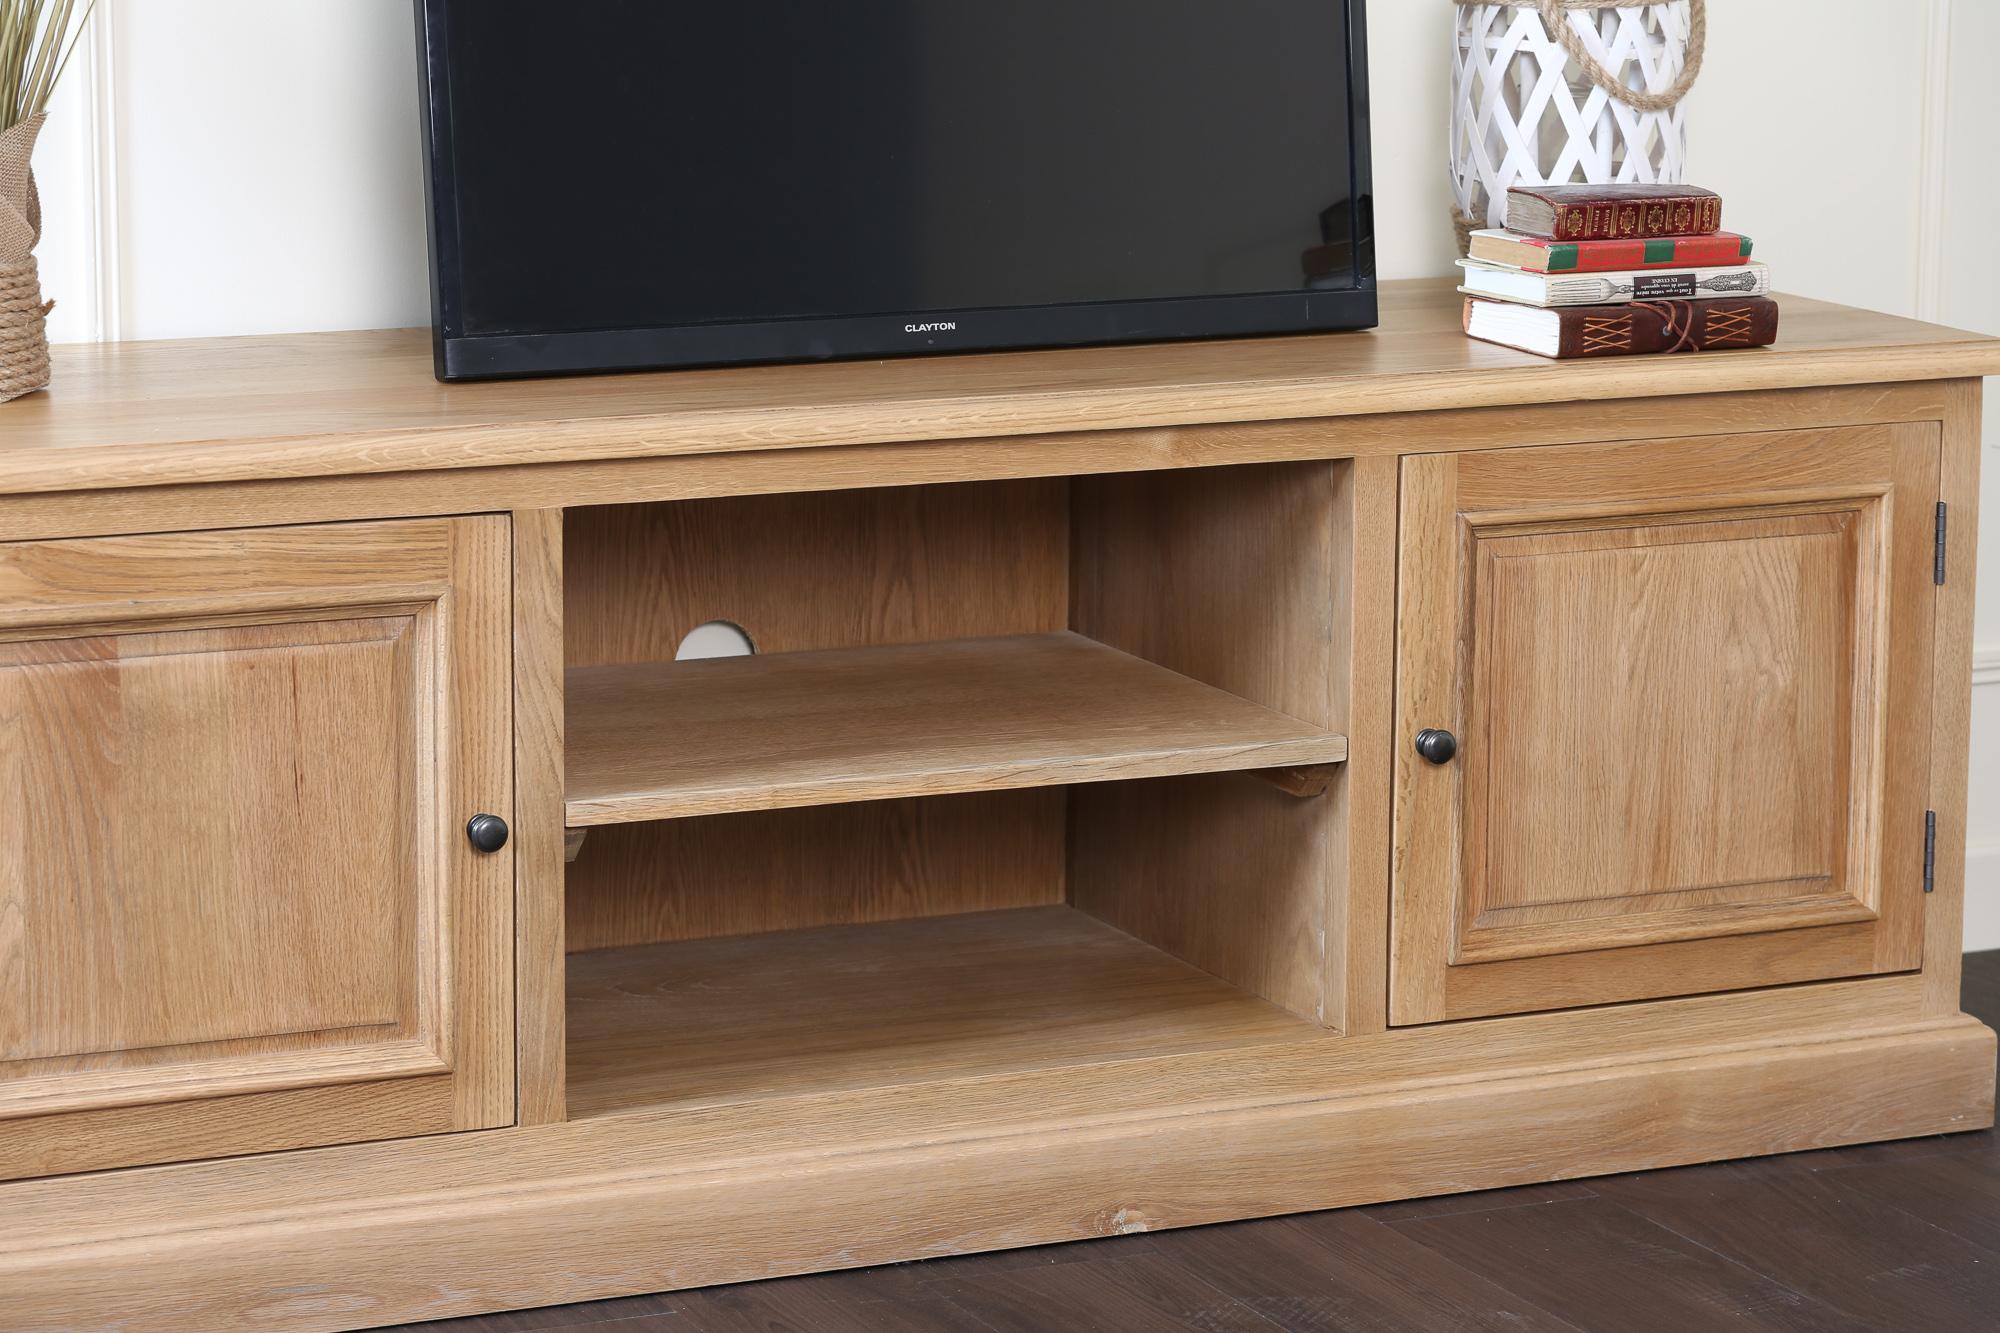 meuble tv avec rangement classique chic chene massif 170cm medicis